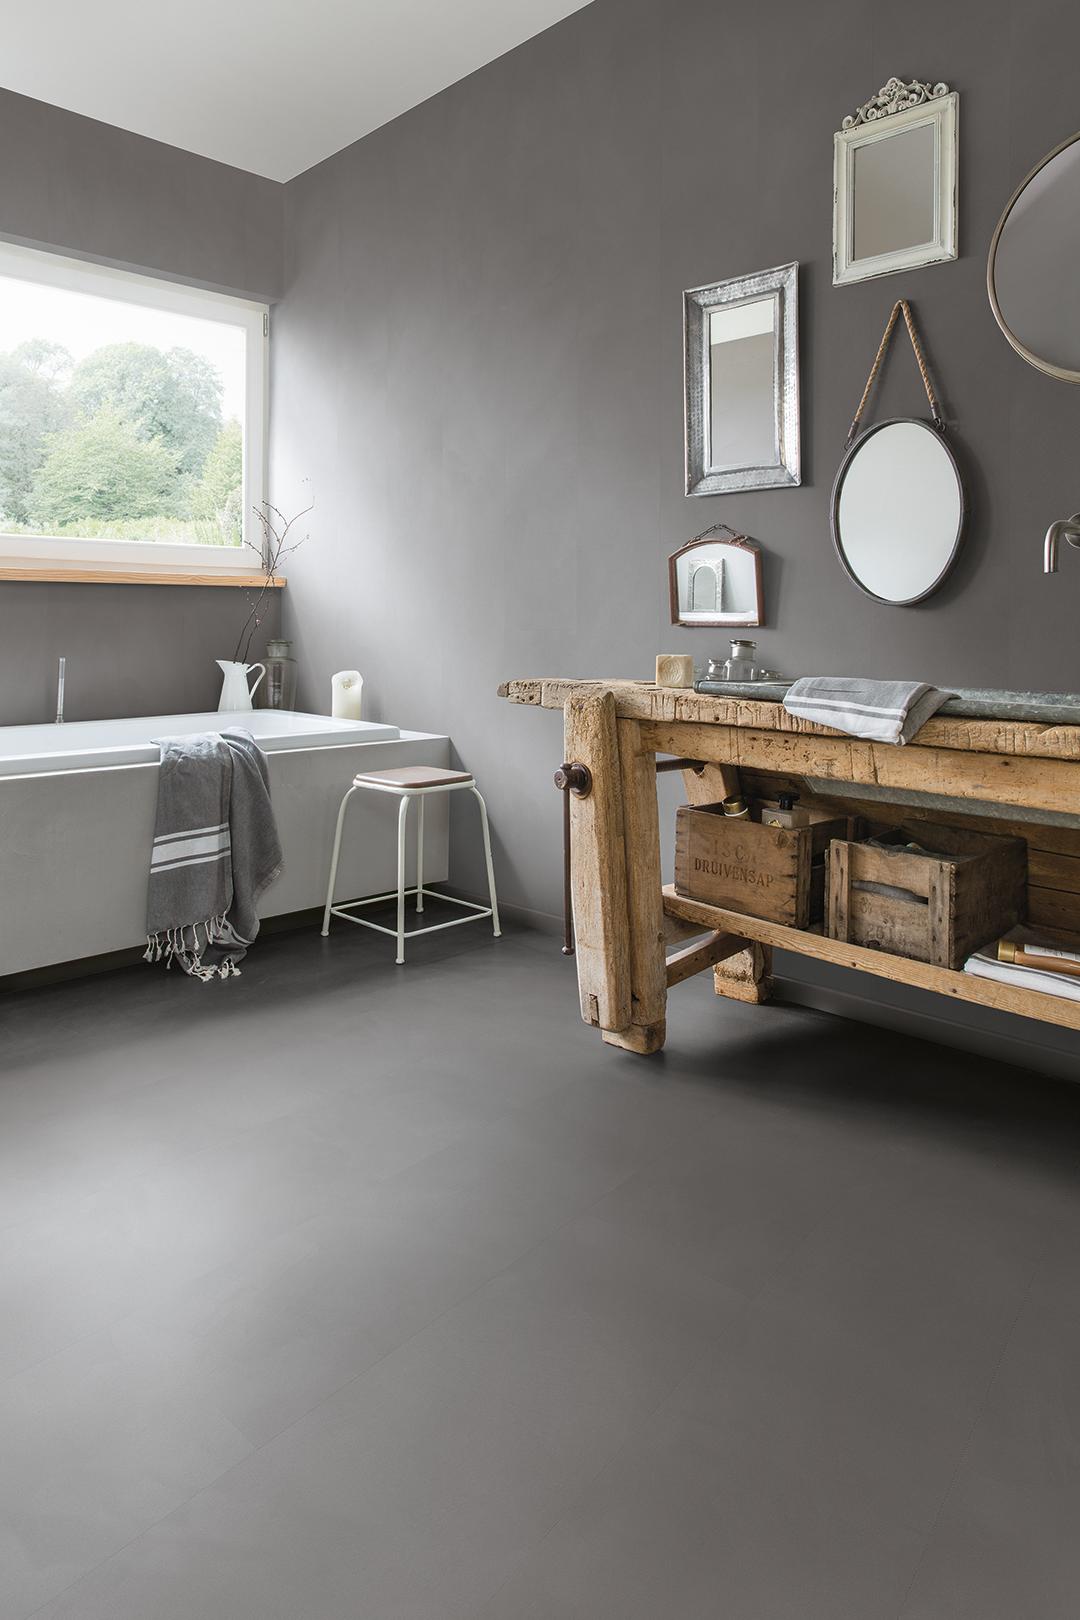 Choose The Perfect Bathroom Floor Quick Step Co Uk Vinyl Flooring Patterned Bathroom Tiles Color Bathroom Design